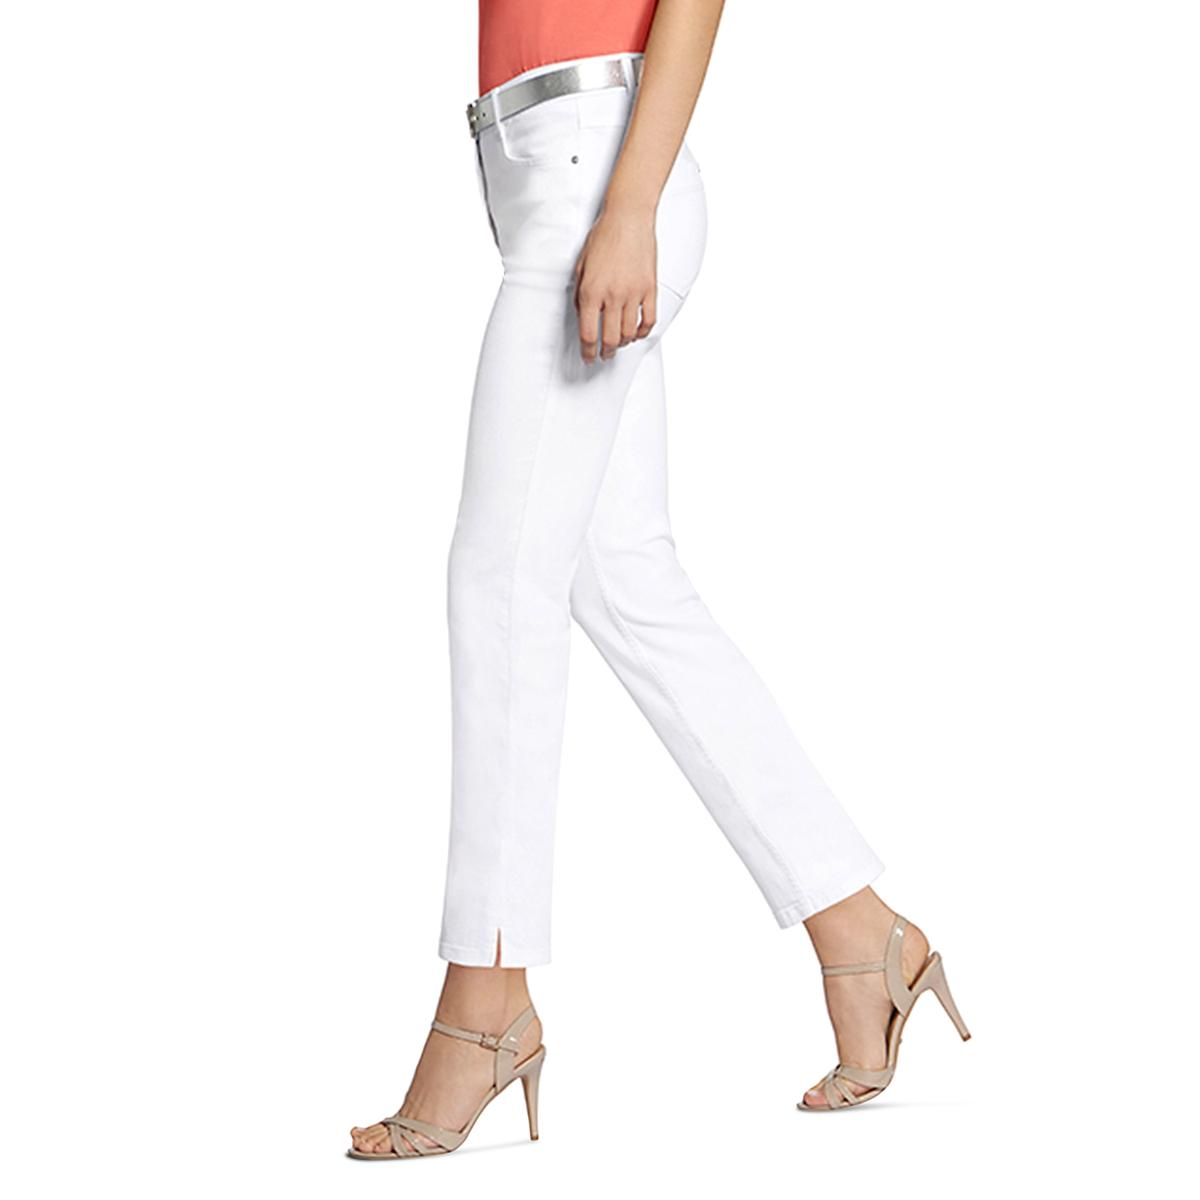 Basler Womens Denim Mid-Rise Casual Skinny Jeans BHFO 5238